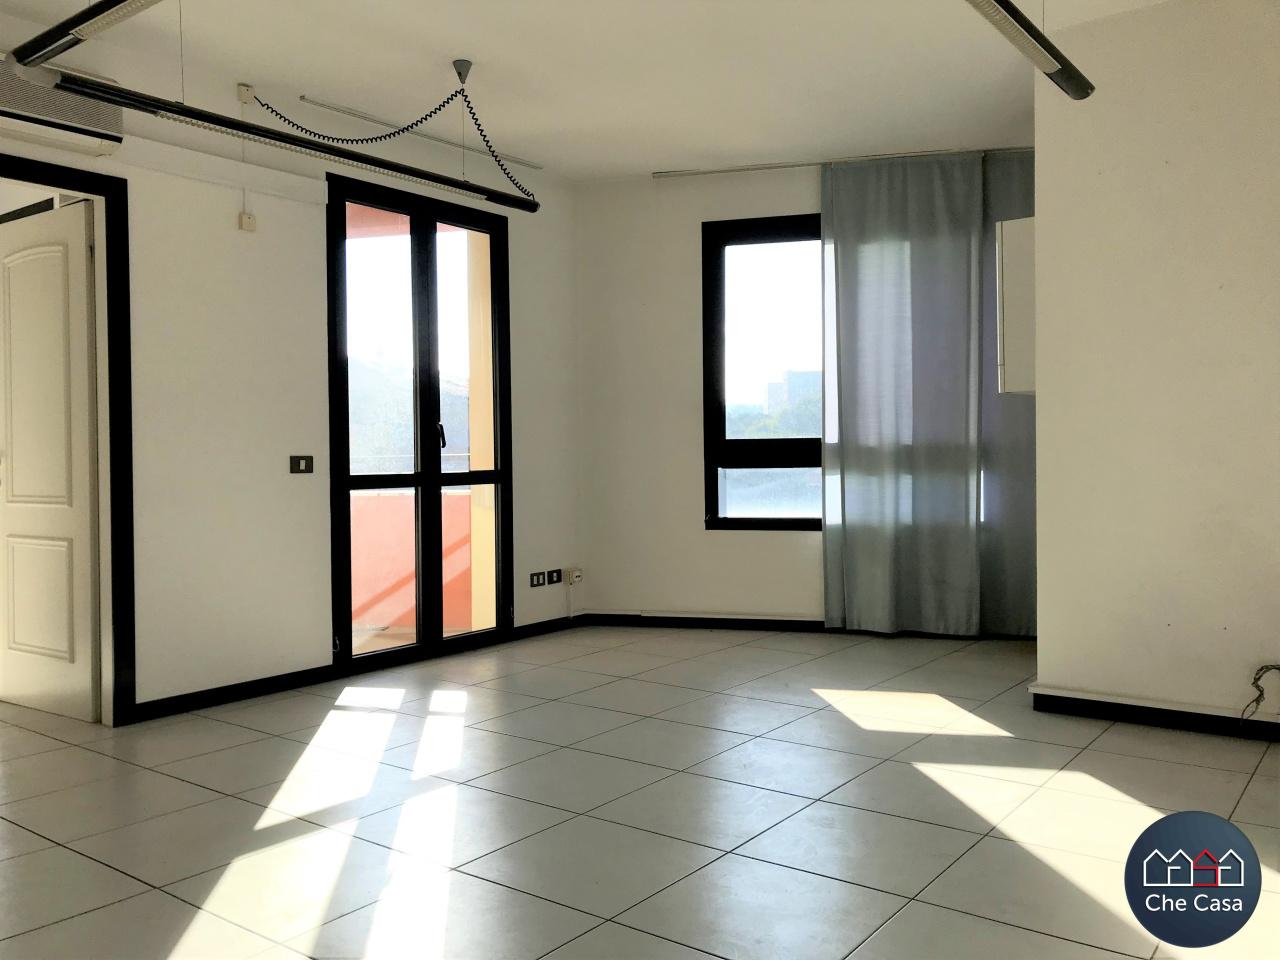 Appartamento - Bilocale a Zona Ospedale, Cesena